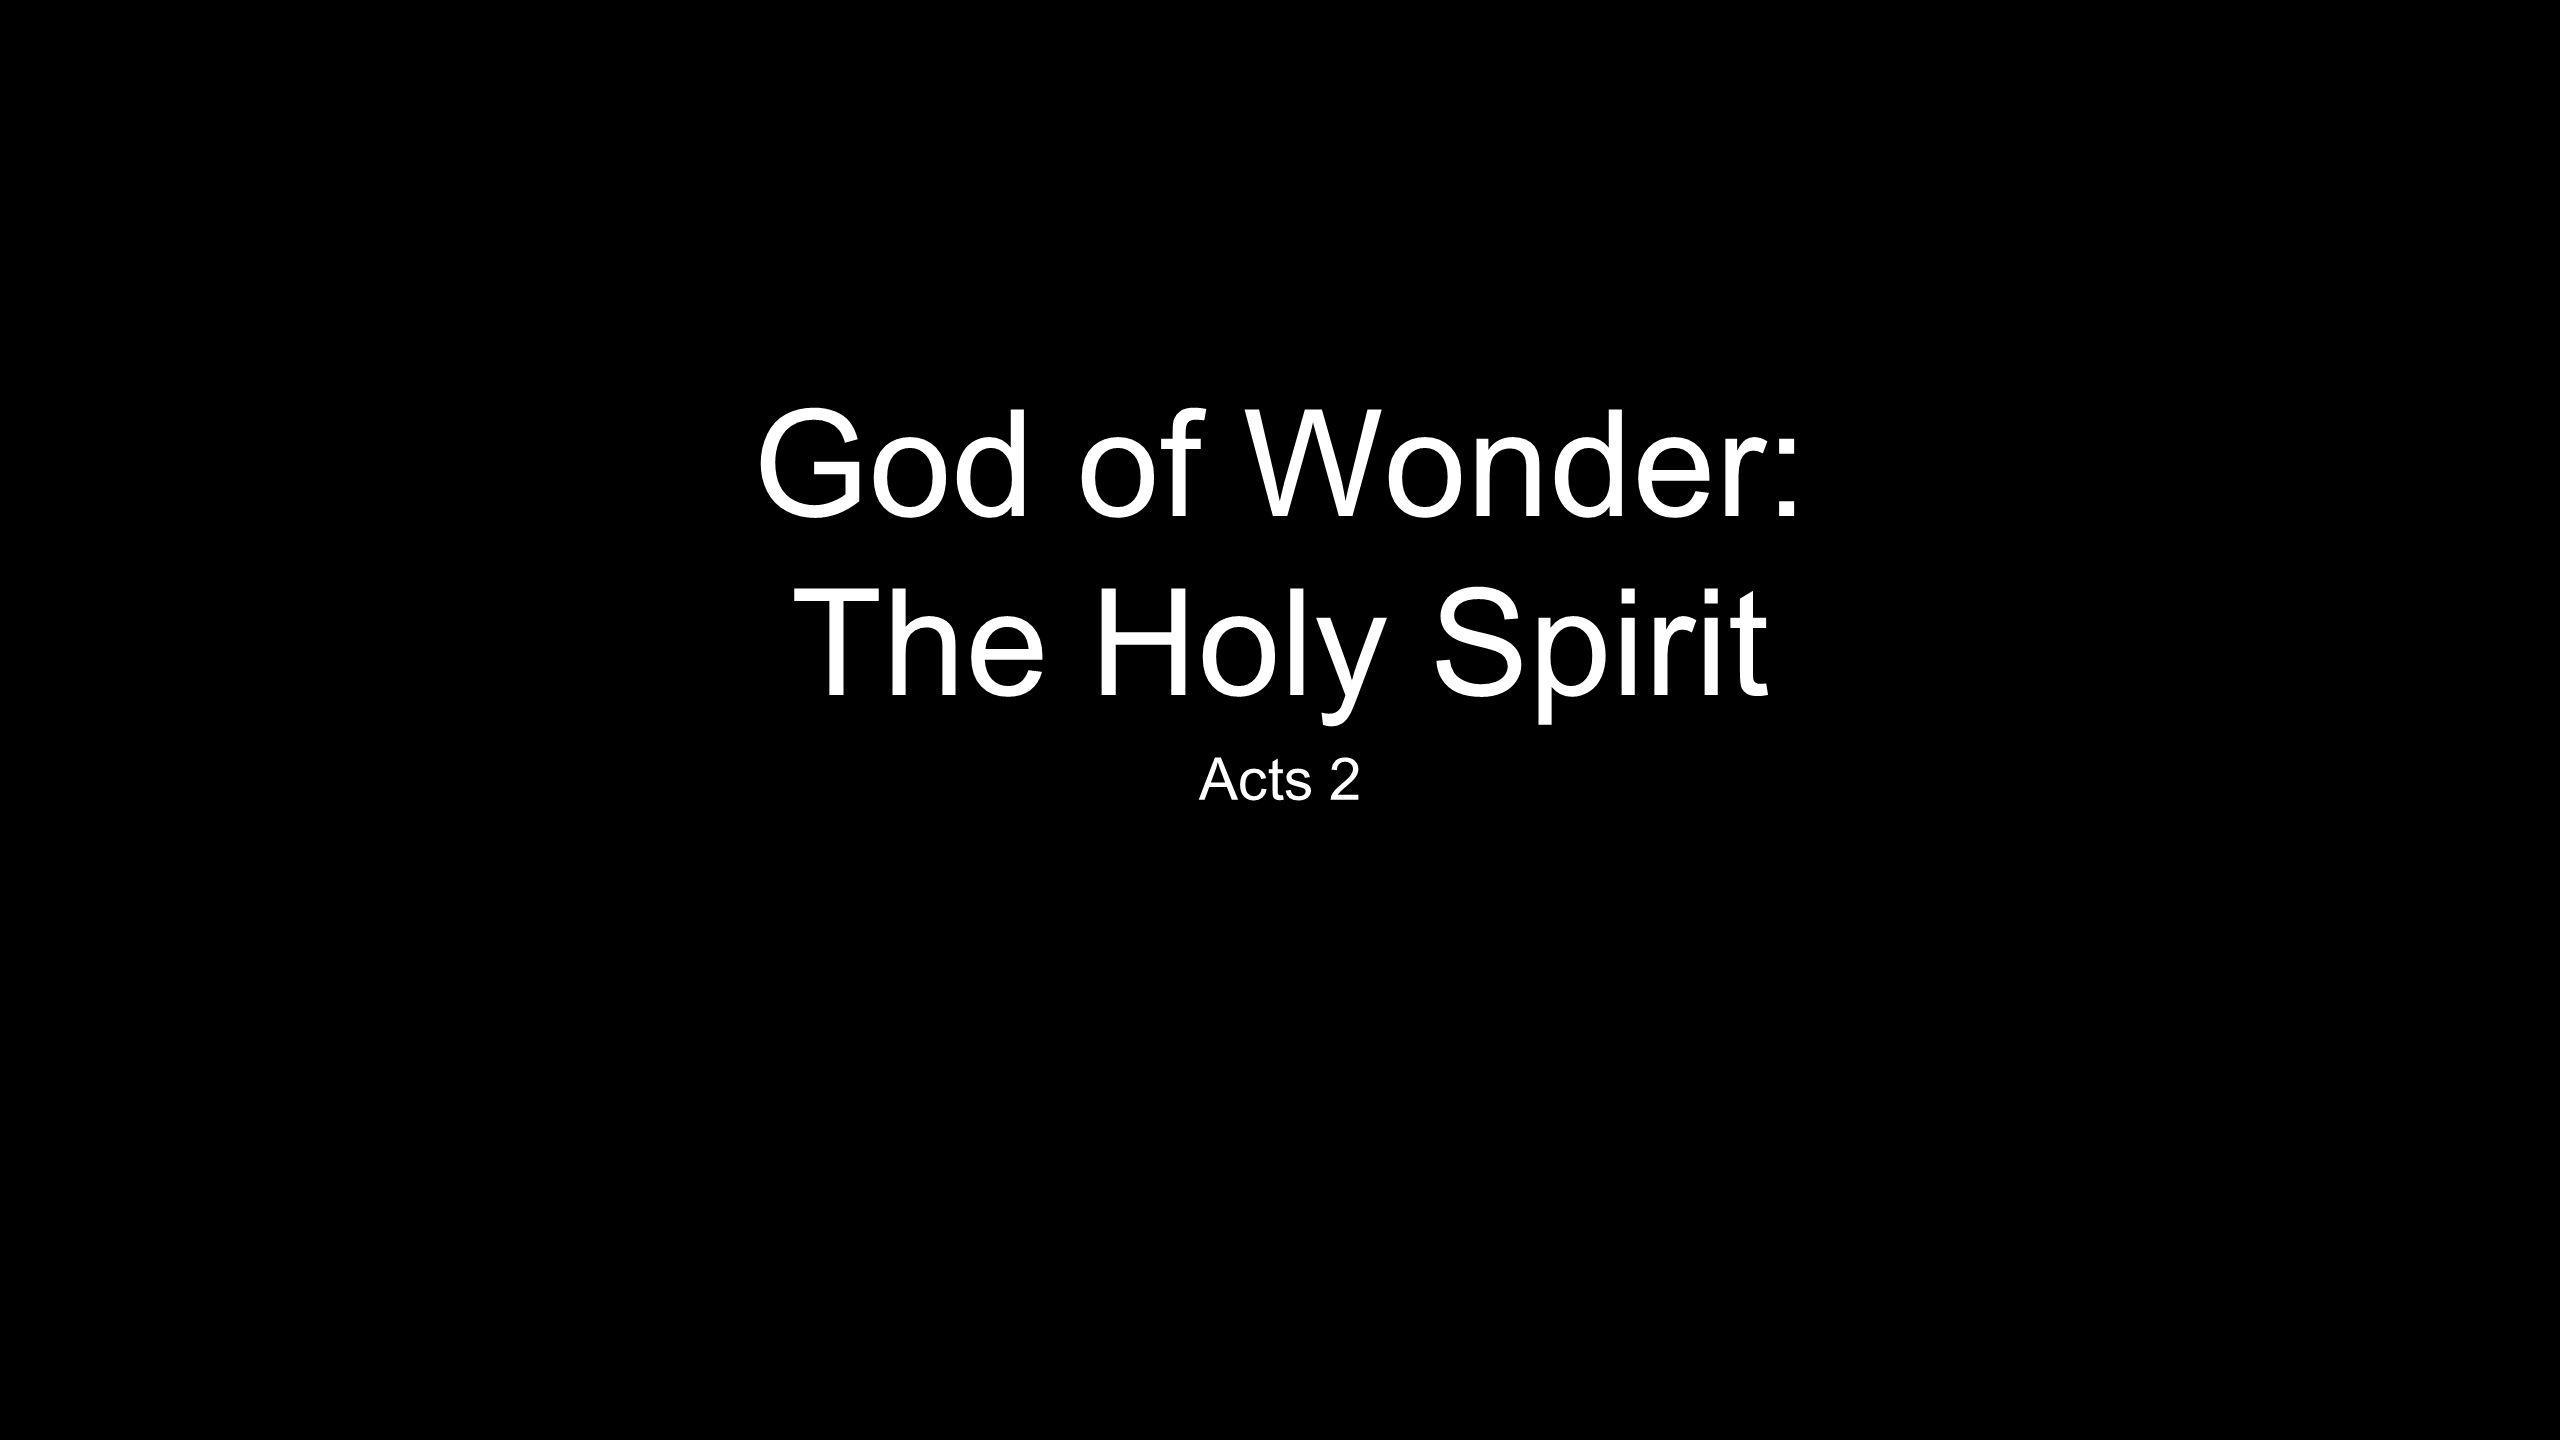 God of Wonder: The Holy Spirit Acts 2